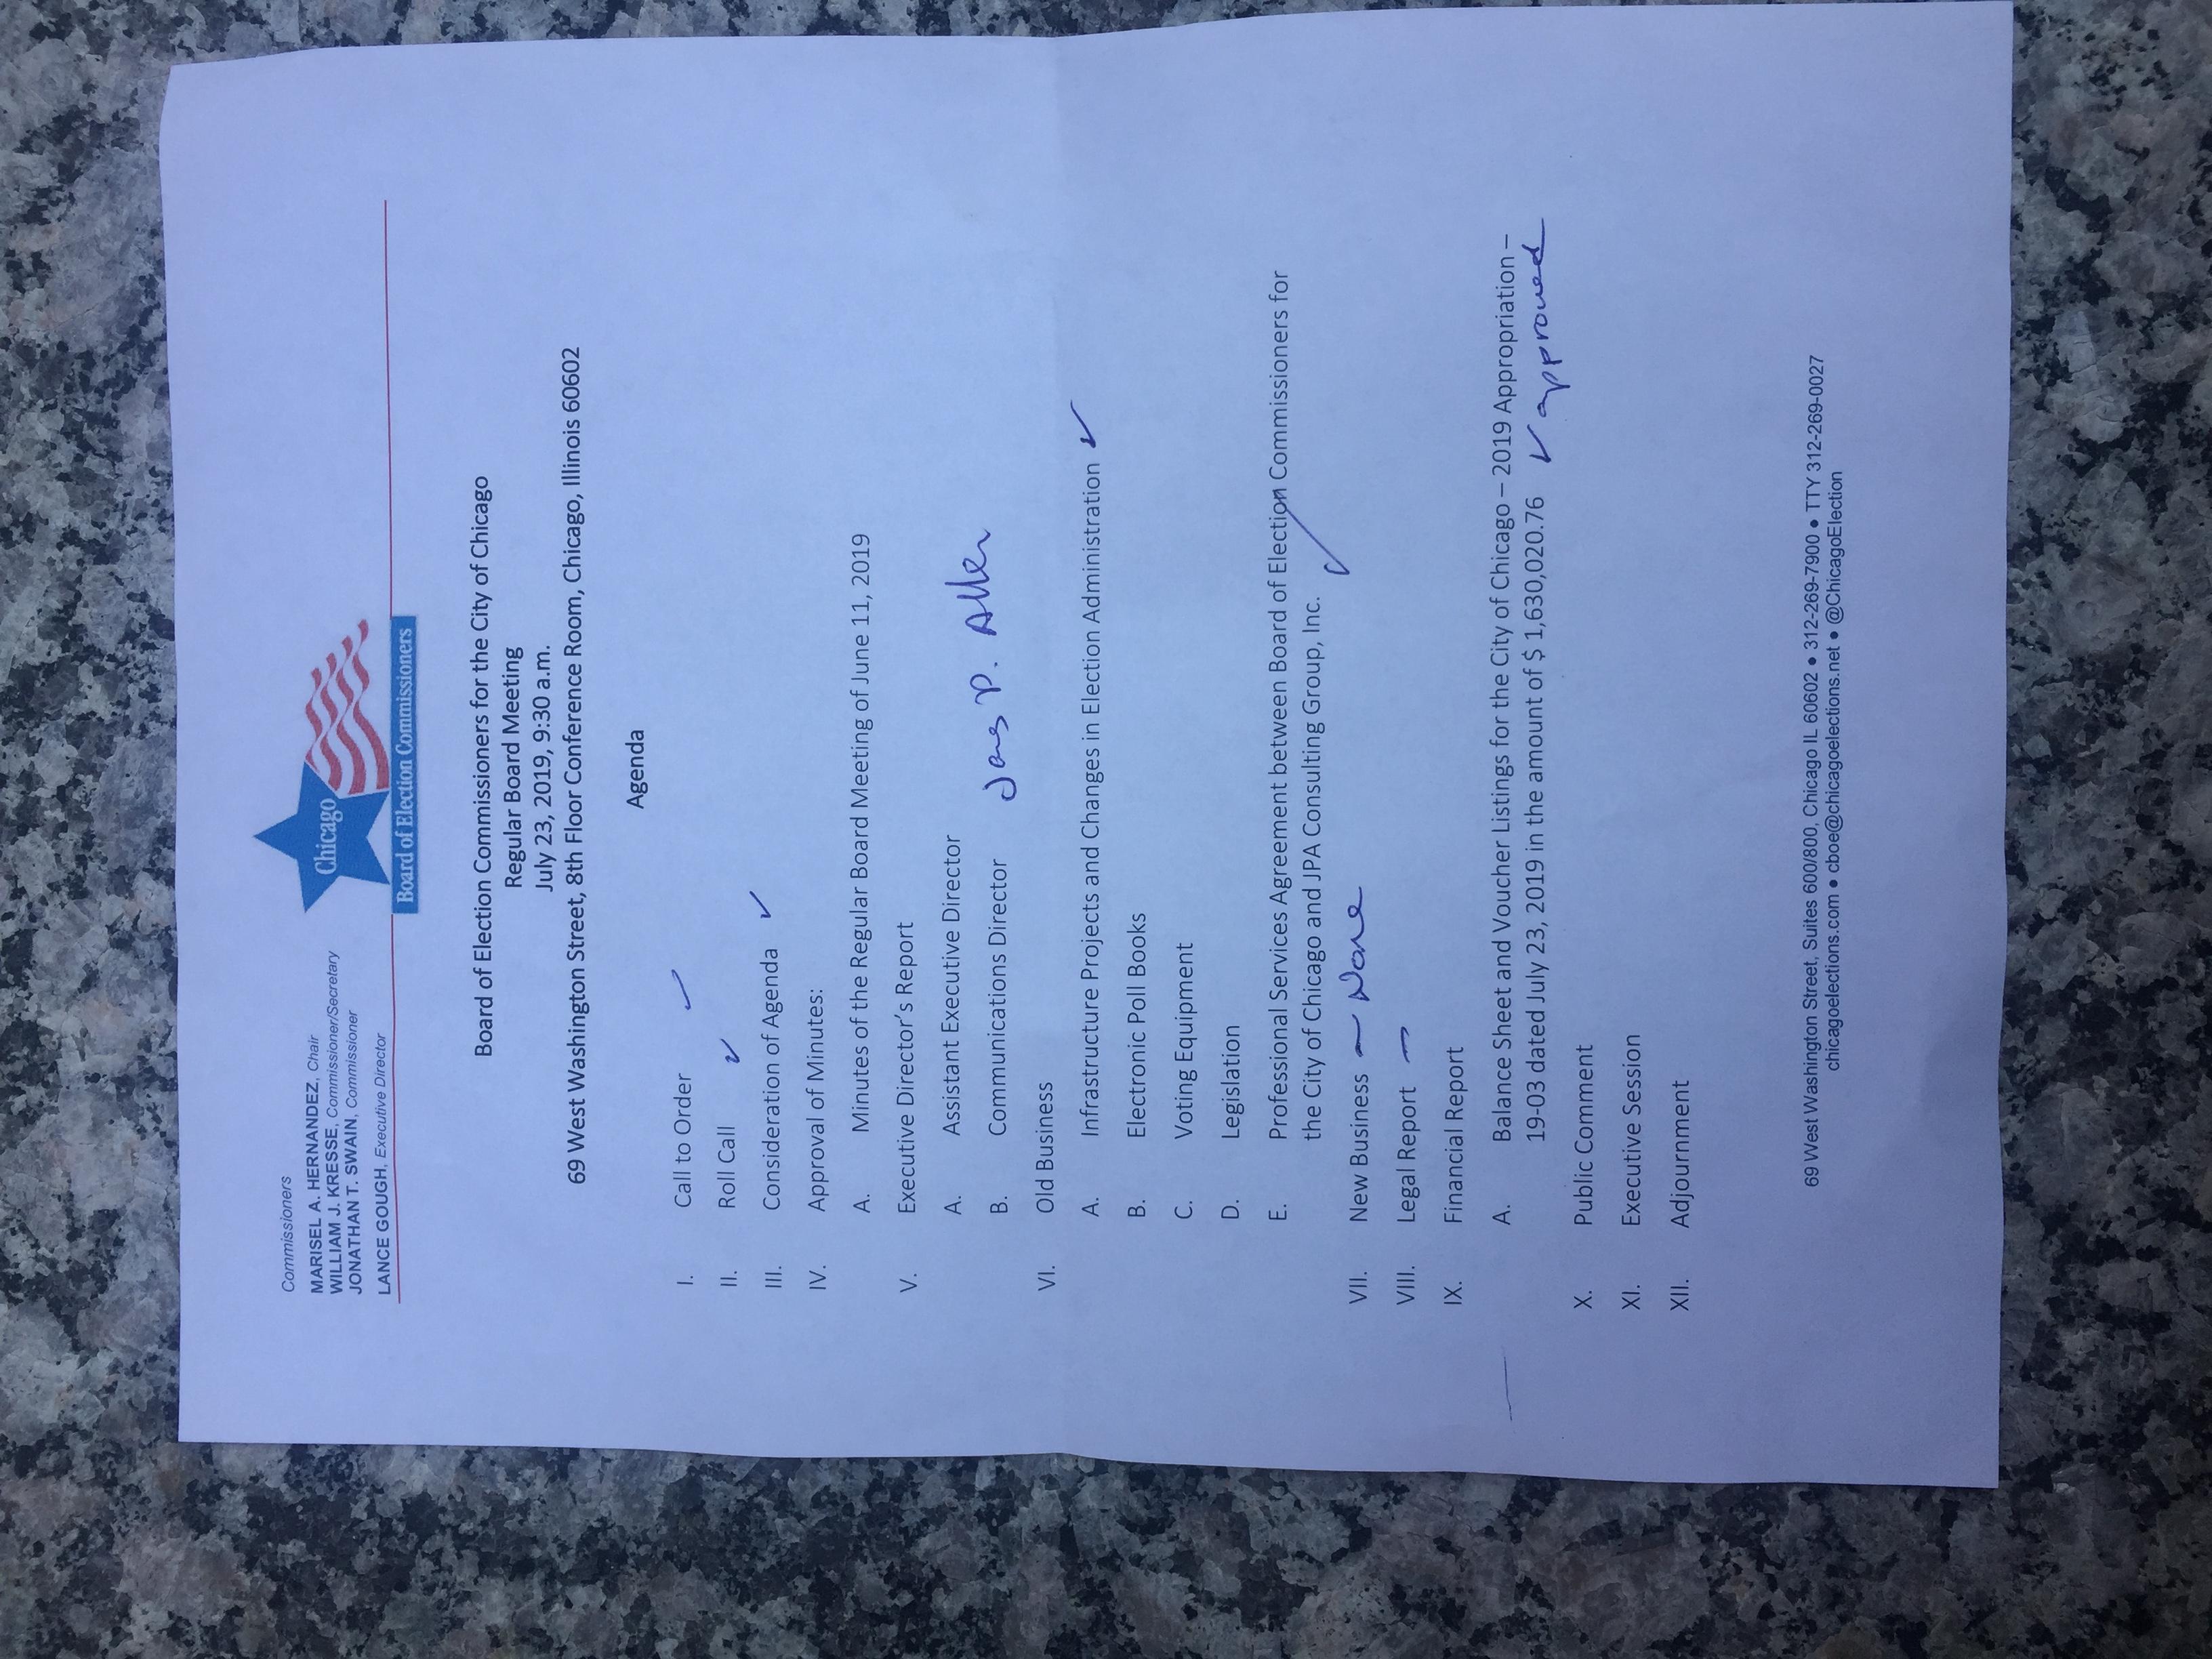 Board of Election Agenda